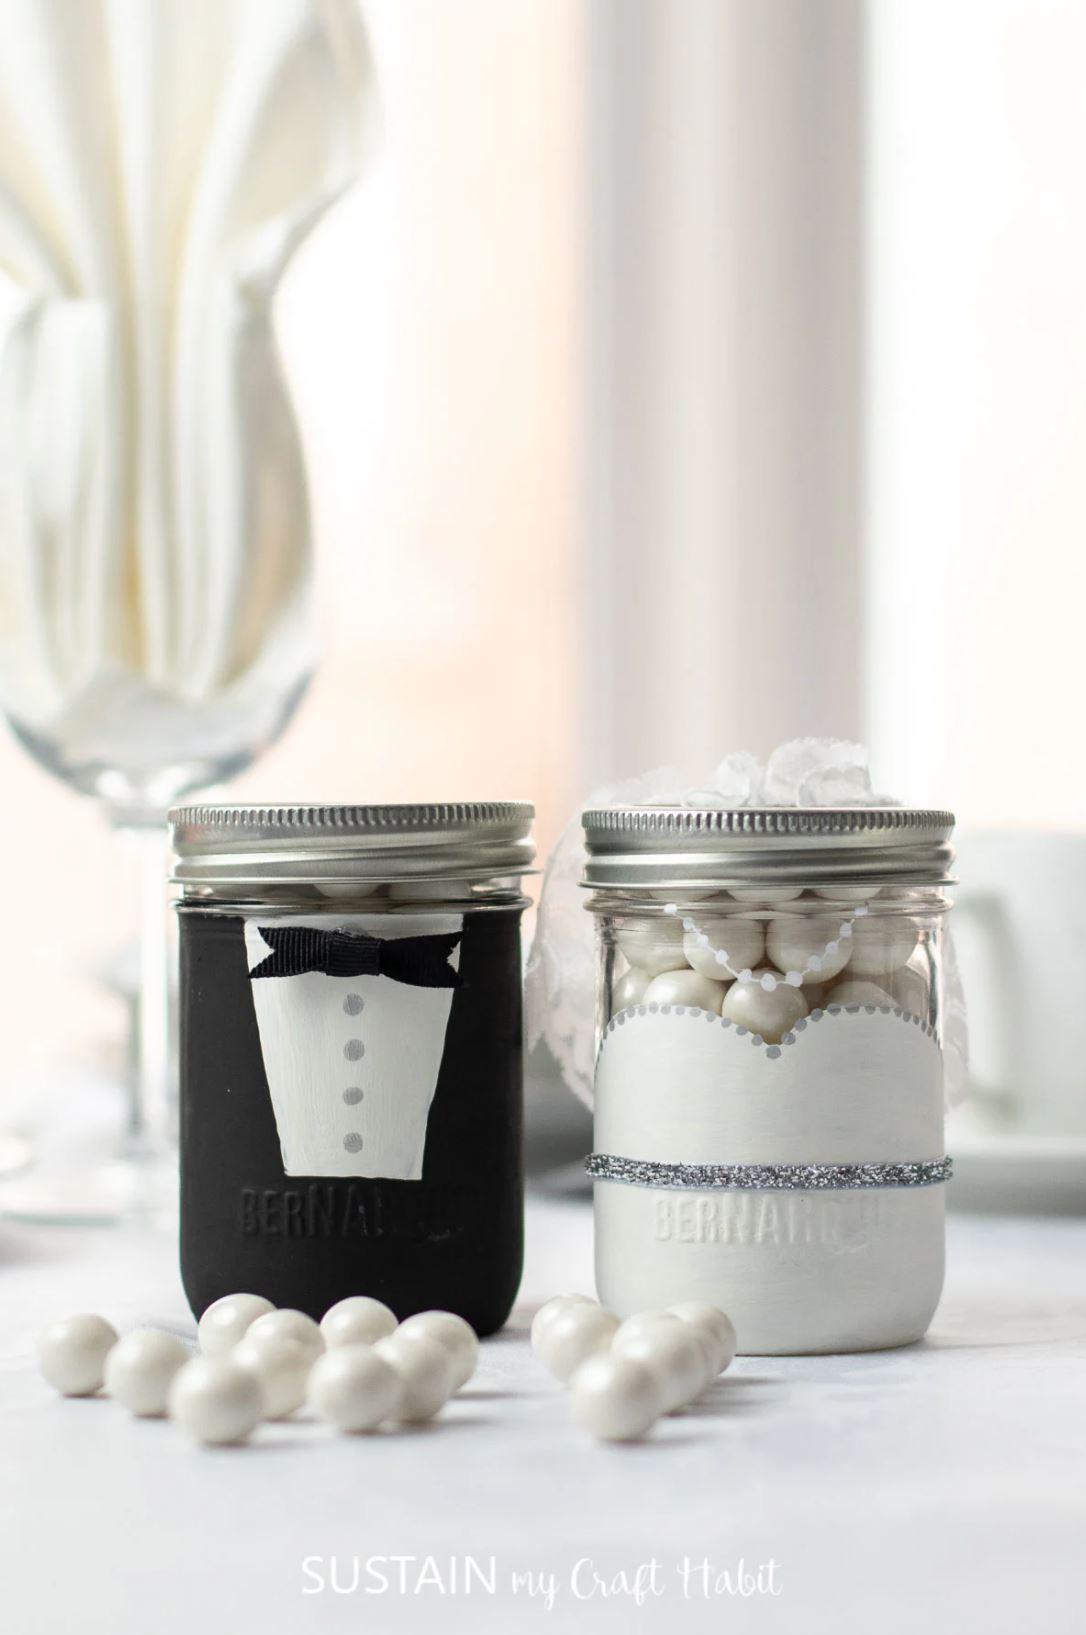 Bride and groom mason jar wedding favors.